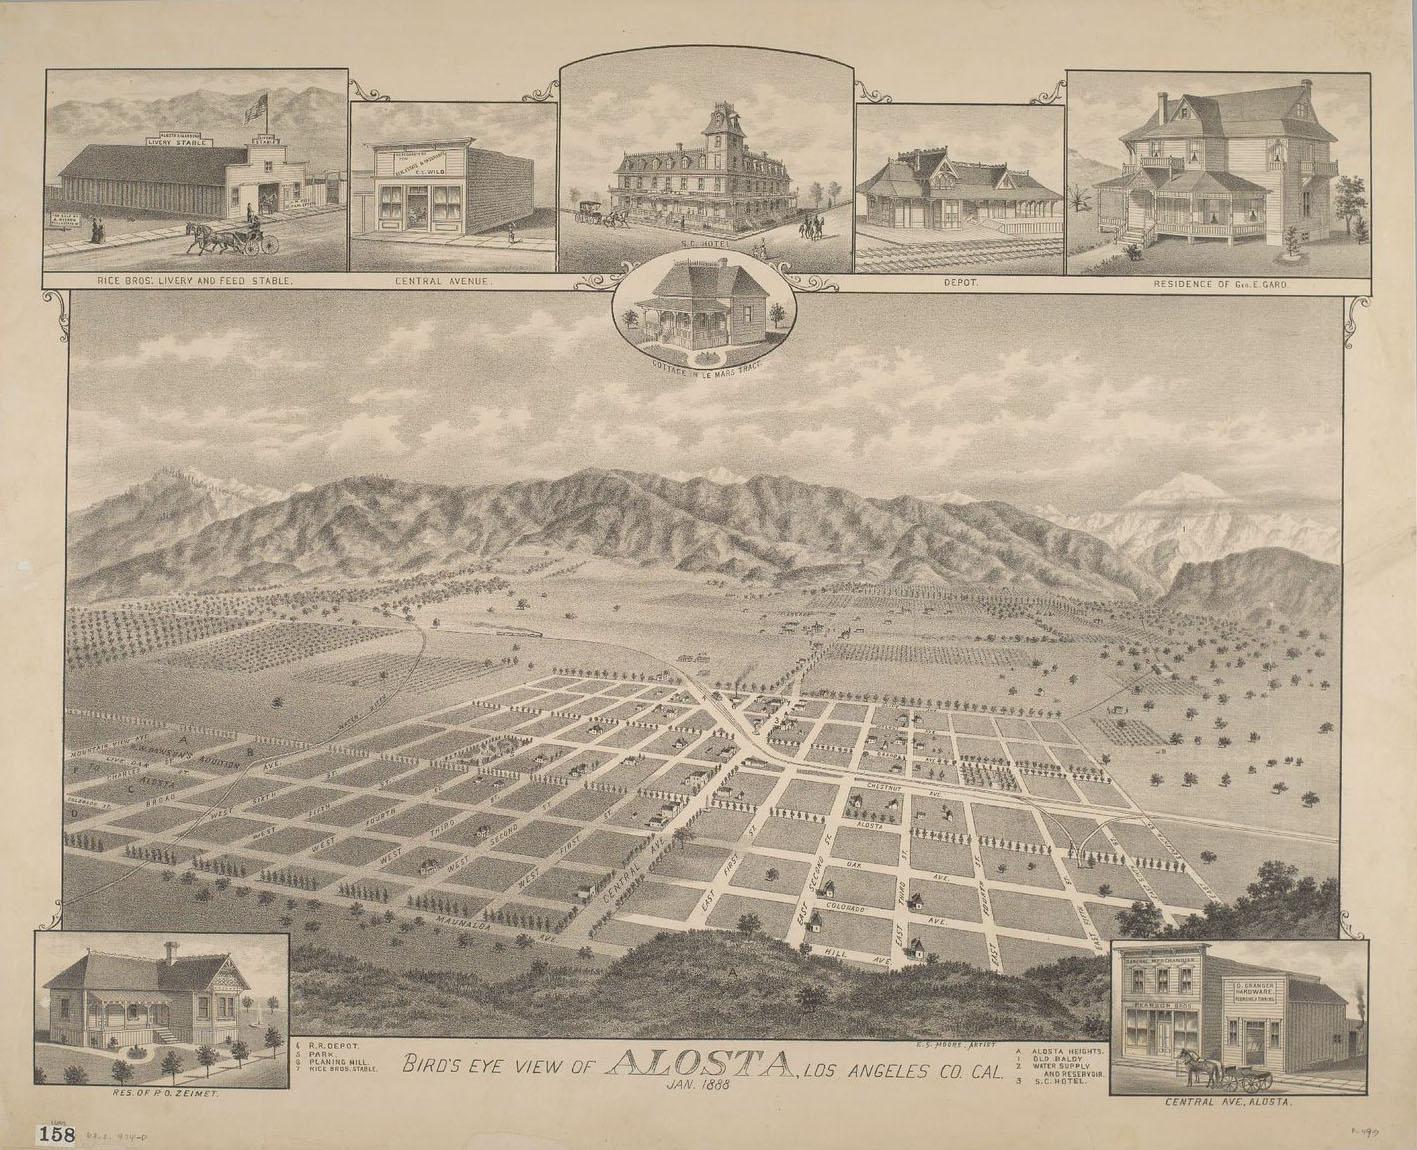 Photograph courtesy of Bancroft Library, UC Berkeley